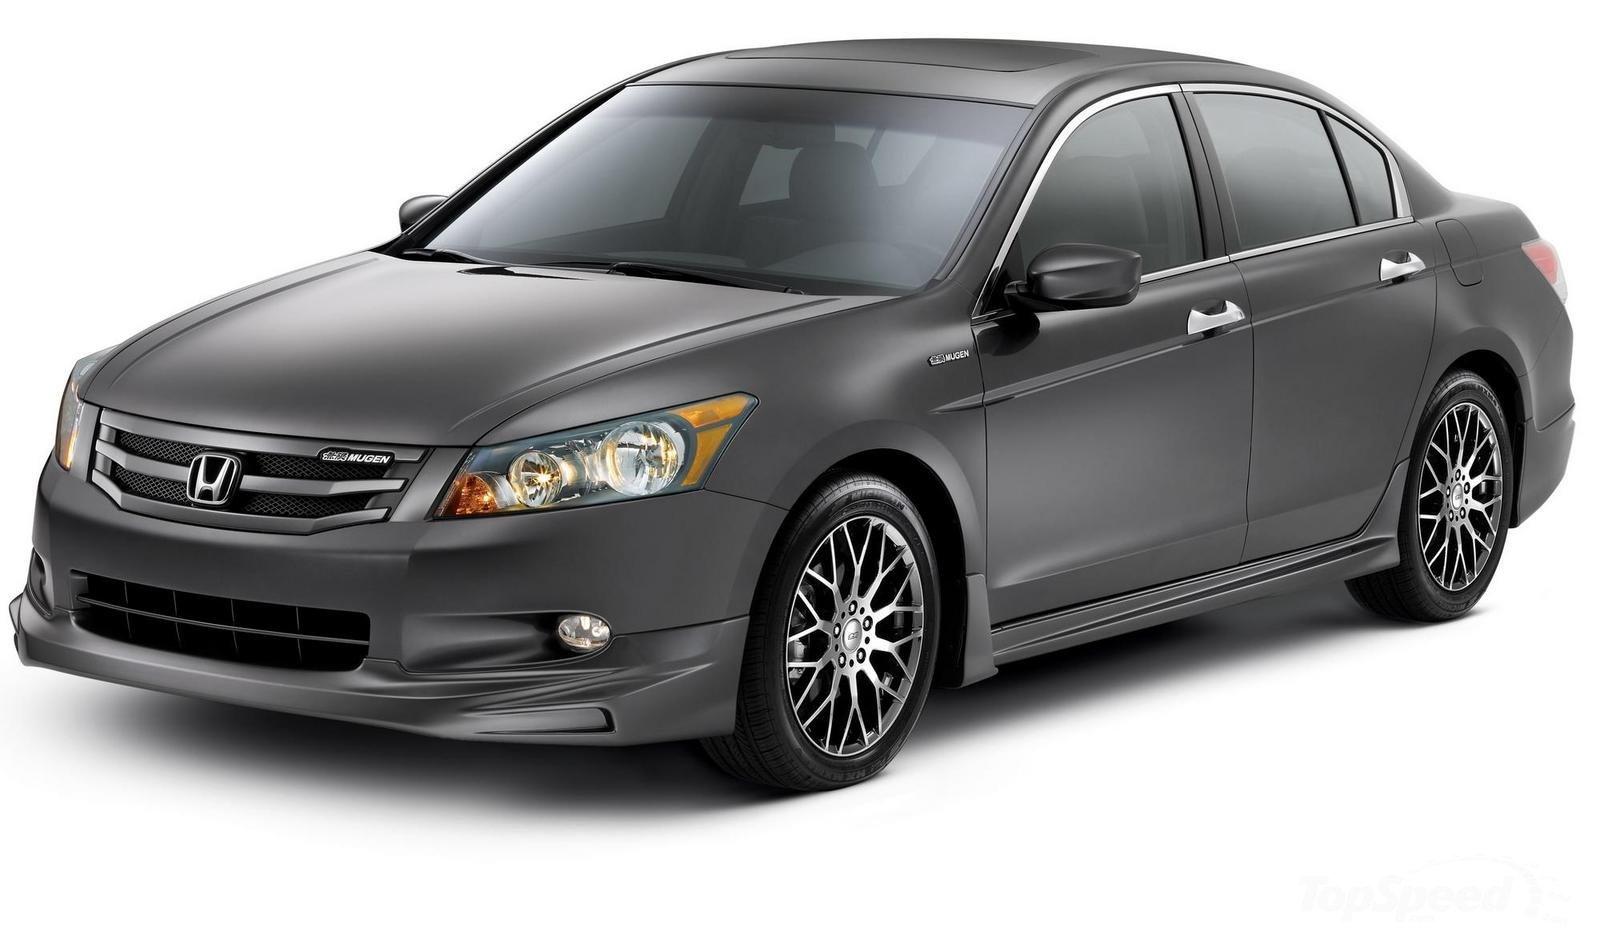 Honda Accord 2012 Is Stylish Sedan Car This New And Dashing Wallpaper Desktop Download